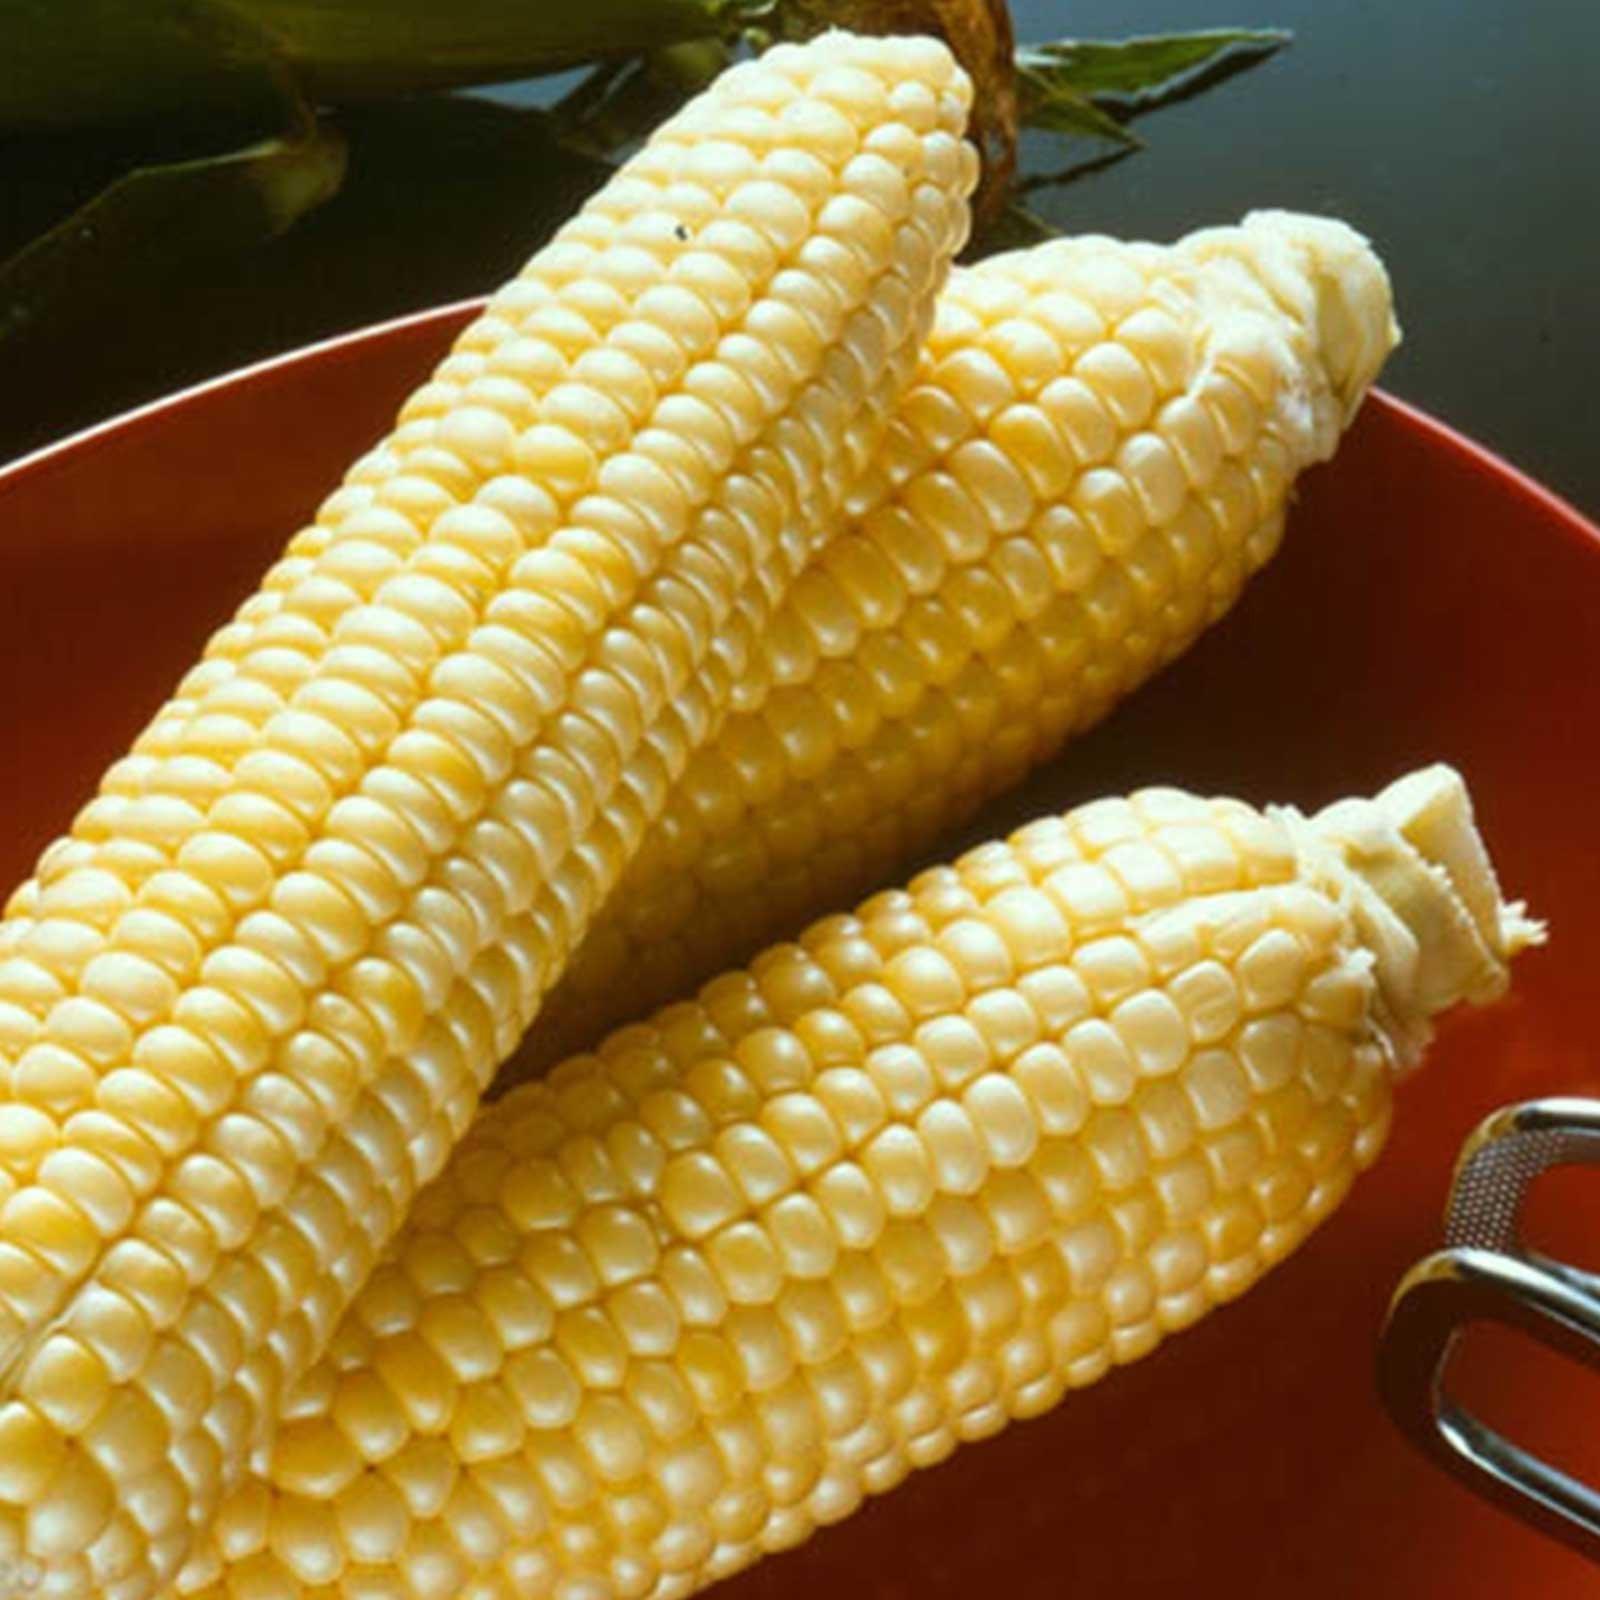 Sugar Buns Hybrid Corn Garden Seed (Treated) - 5 Lb - Non-GMO, Sugary Enhanced (SE), Vegetable Gardening Seeds - Yellow Sweet Corn